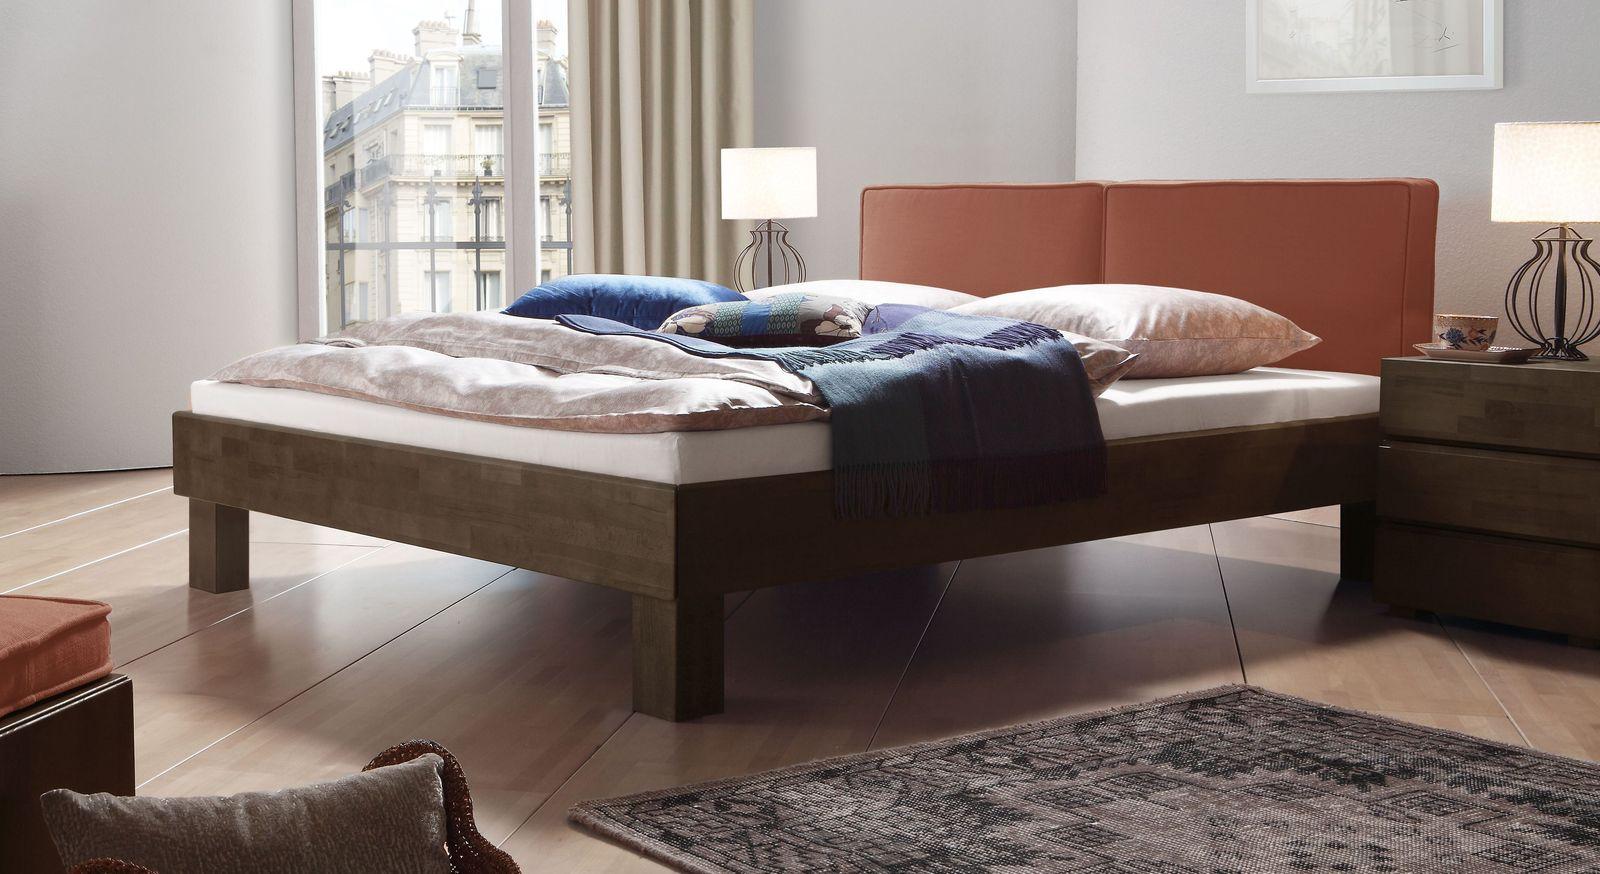 Wengefarbenes Bett Tiago mit rostfarbenem Kopfteil